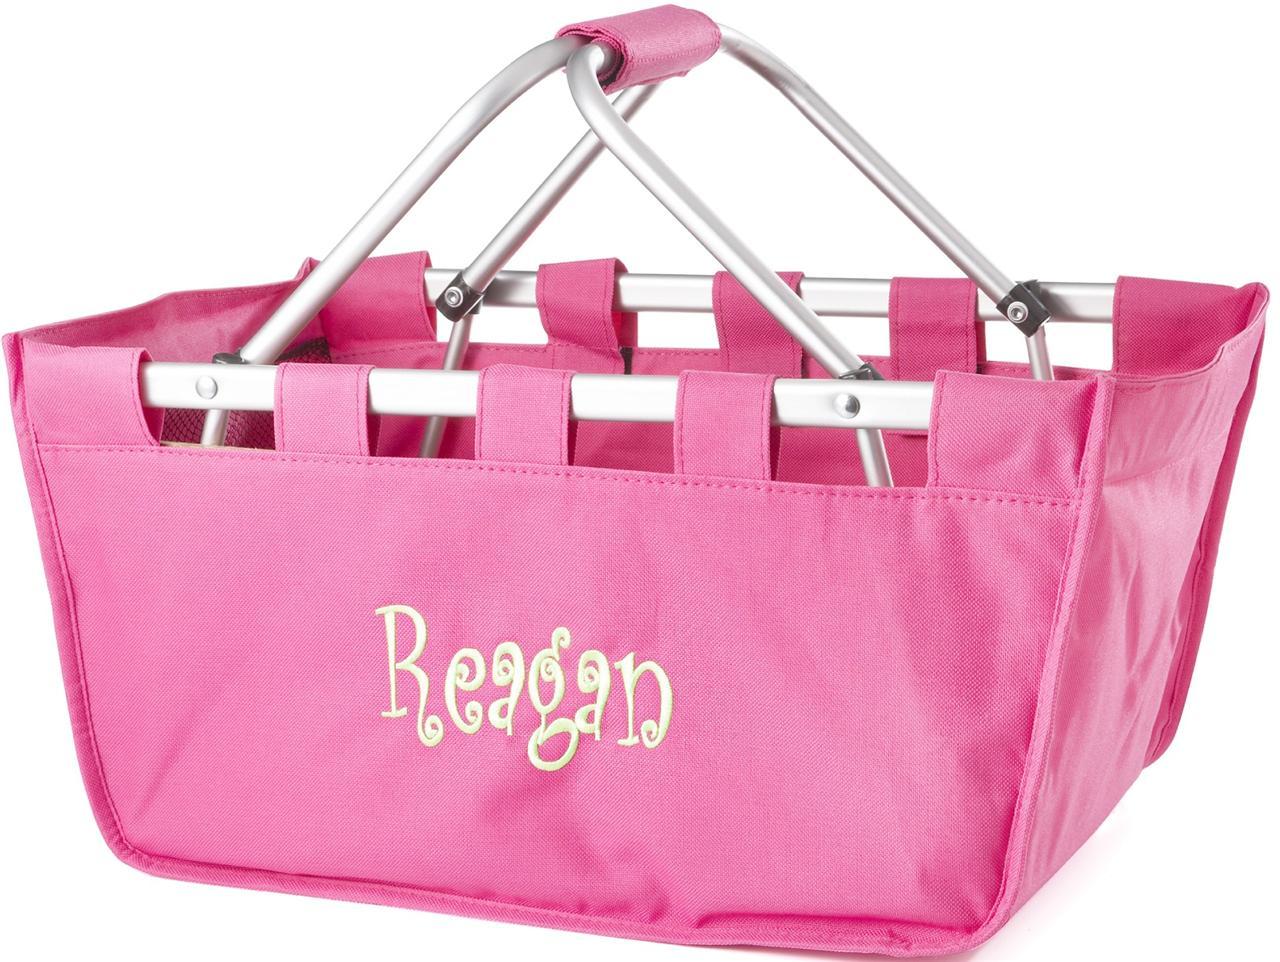 Monogram Tote Bags Monogram Market Tote Basket